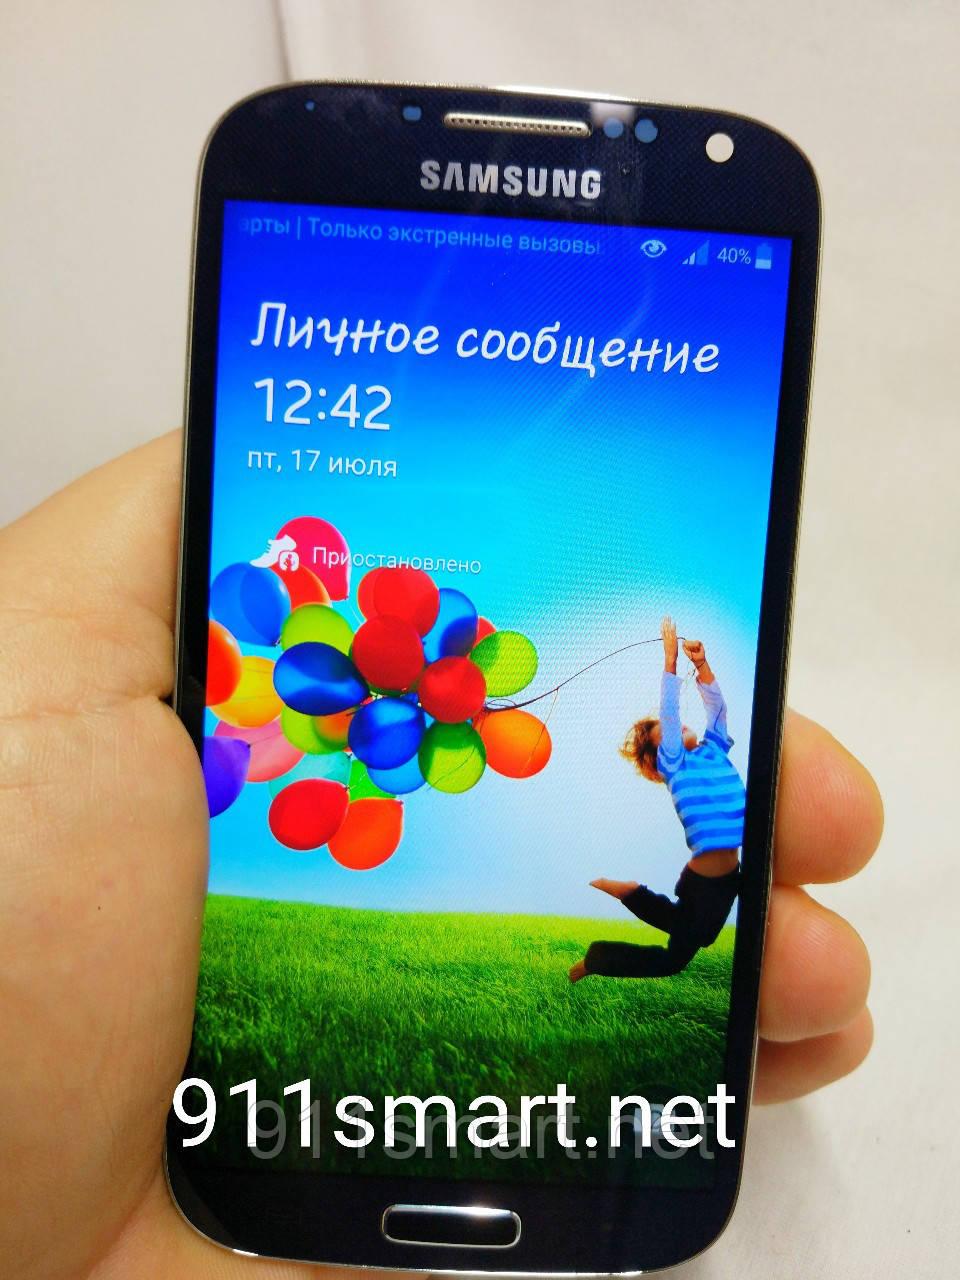 Дисплей, модуль, экран Samsung Galaxy S4 I9505, i9500 super amoled